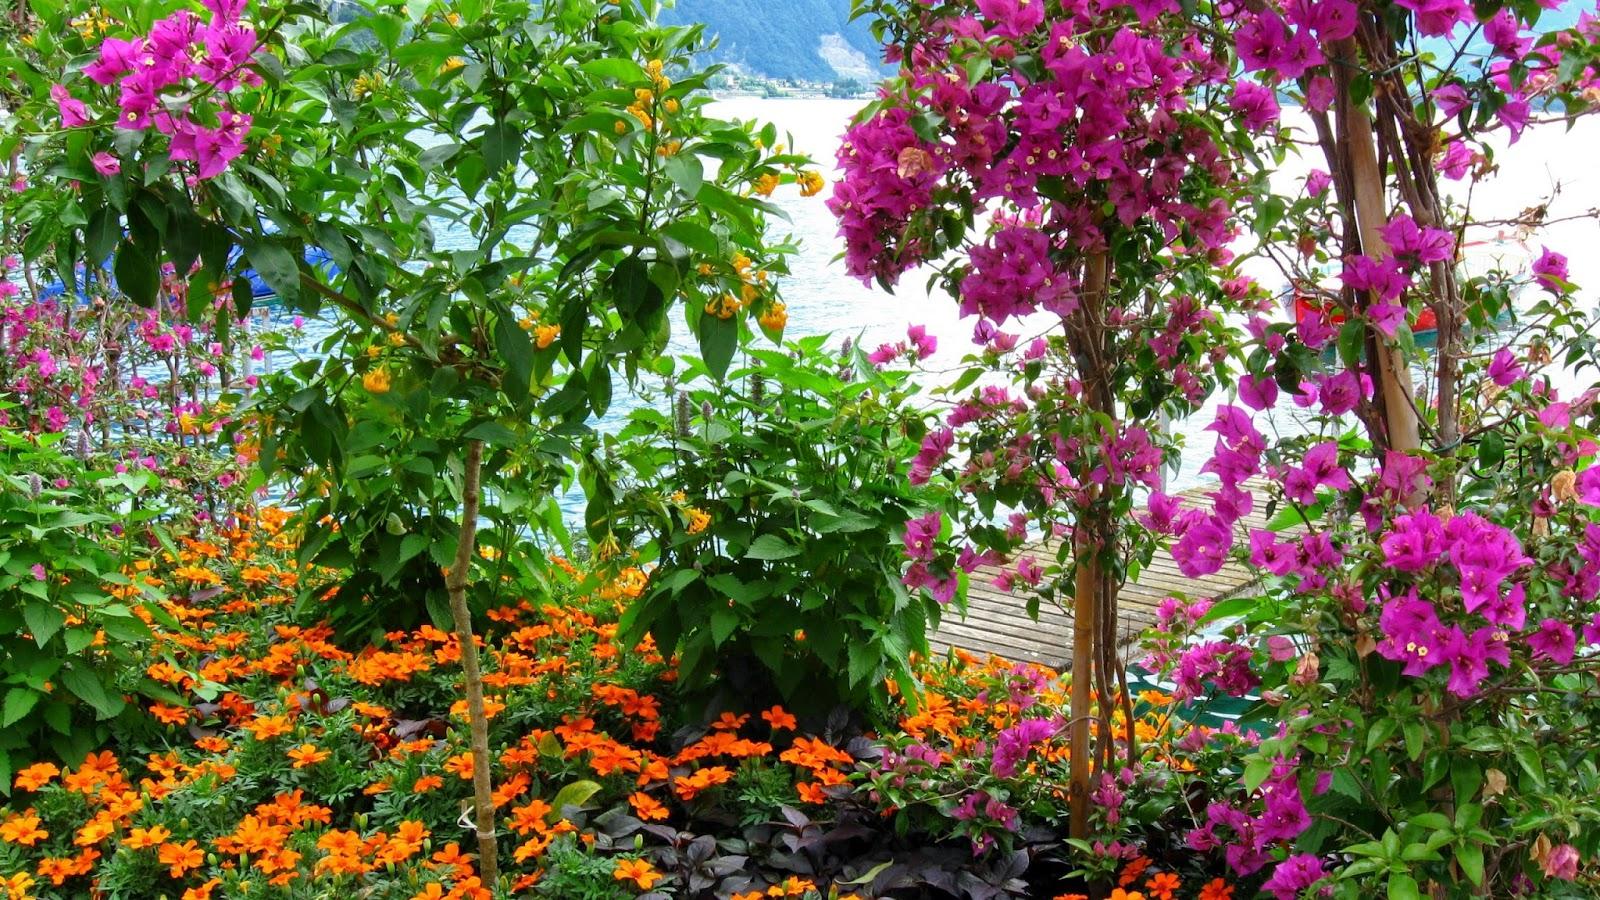 Flower Garden Wallpaper Free Download|http://refreshrose ...